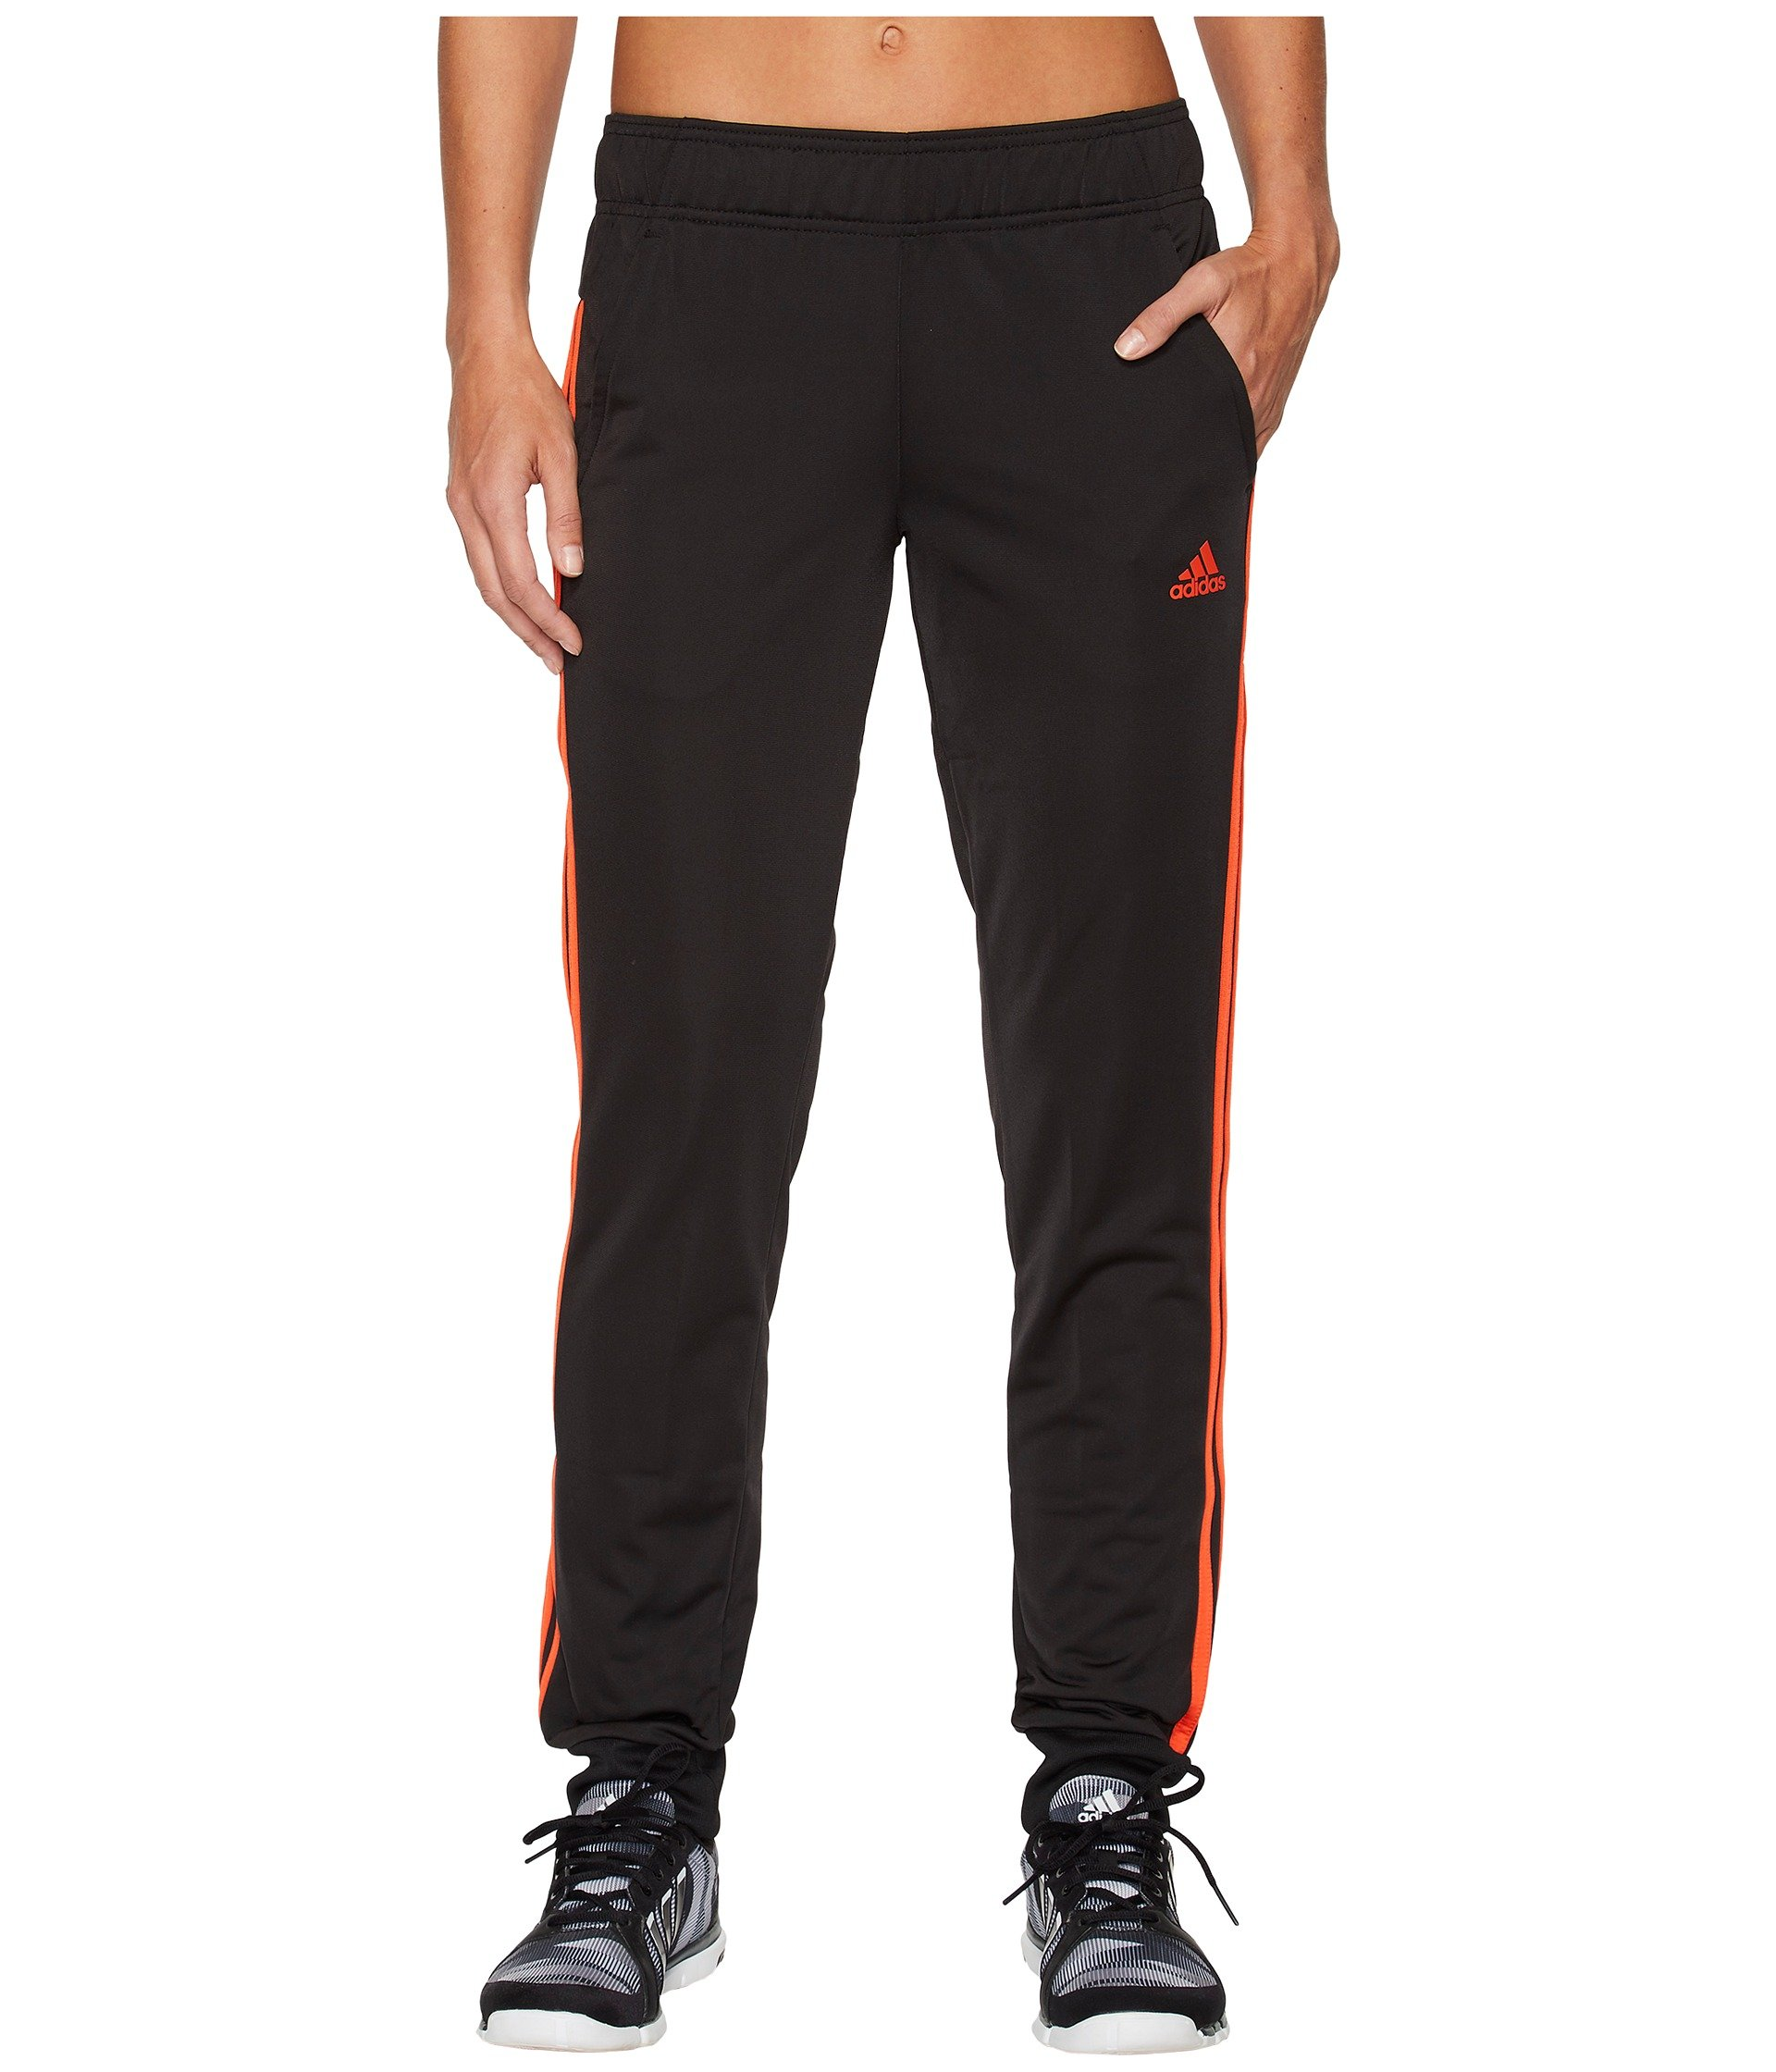 adidas Women's Designed 2 Move Cuff Pants, Black/Energy Pink, Small